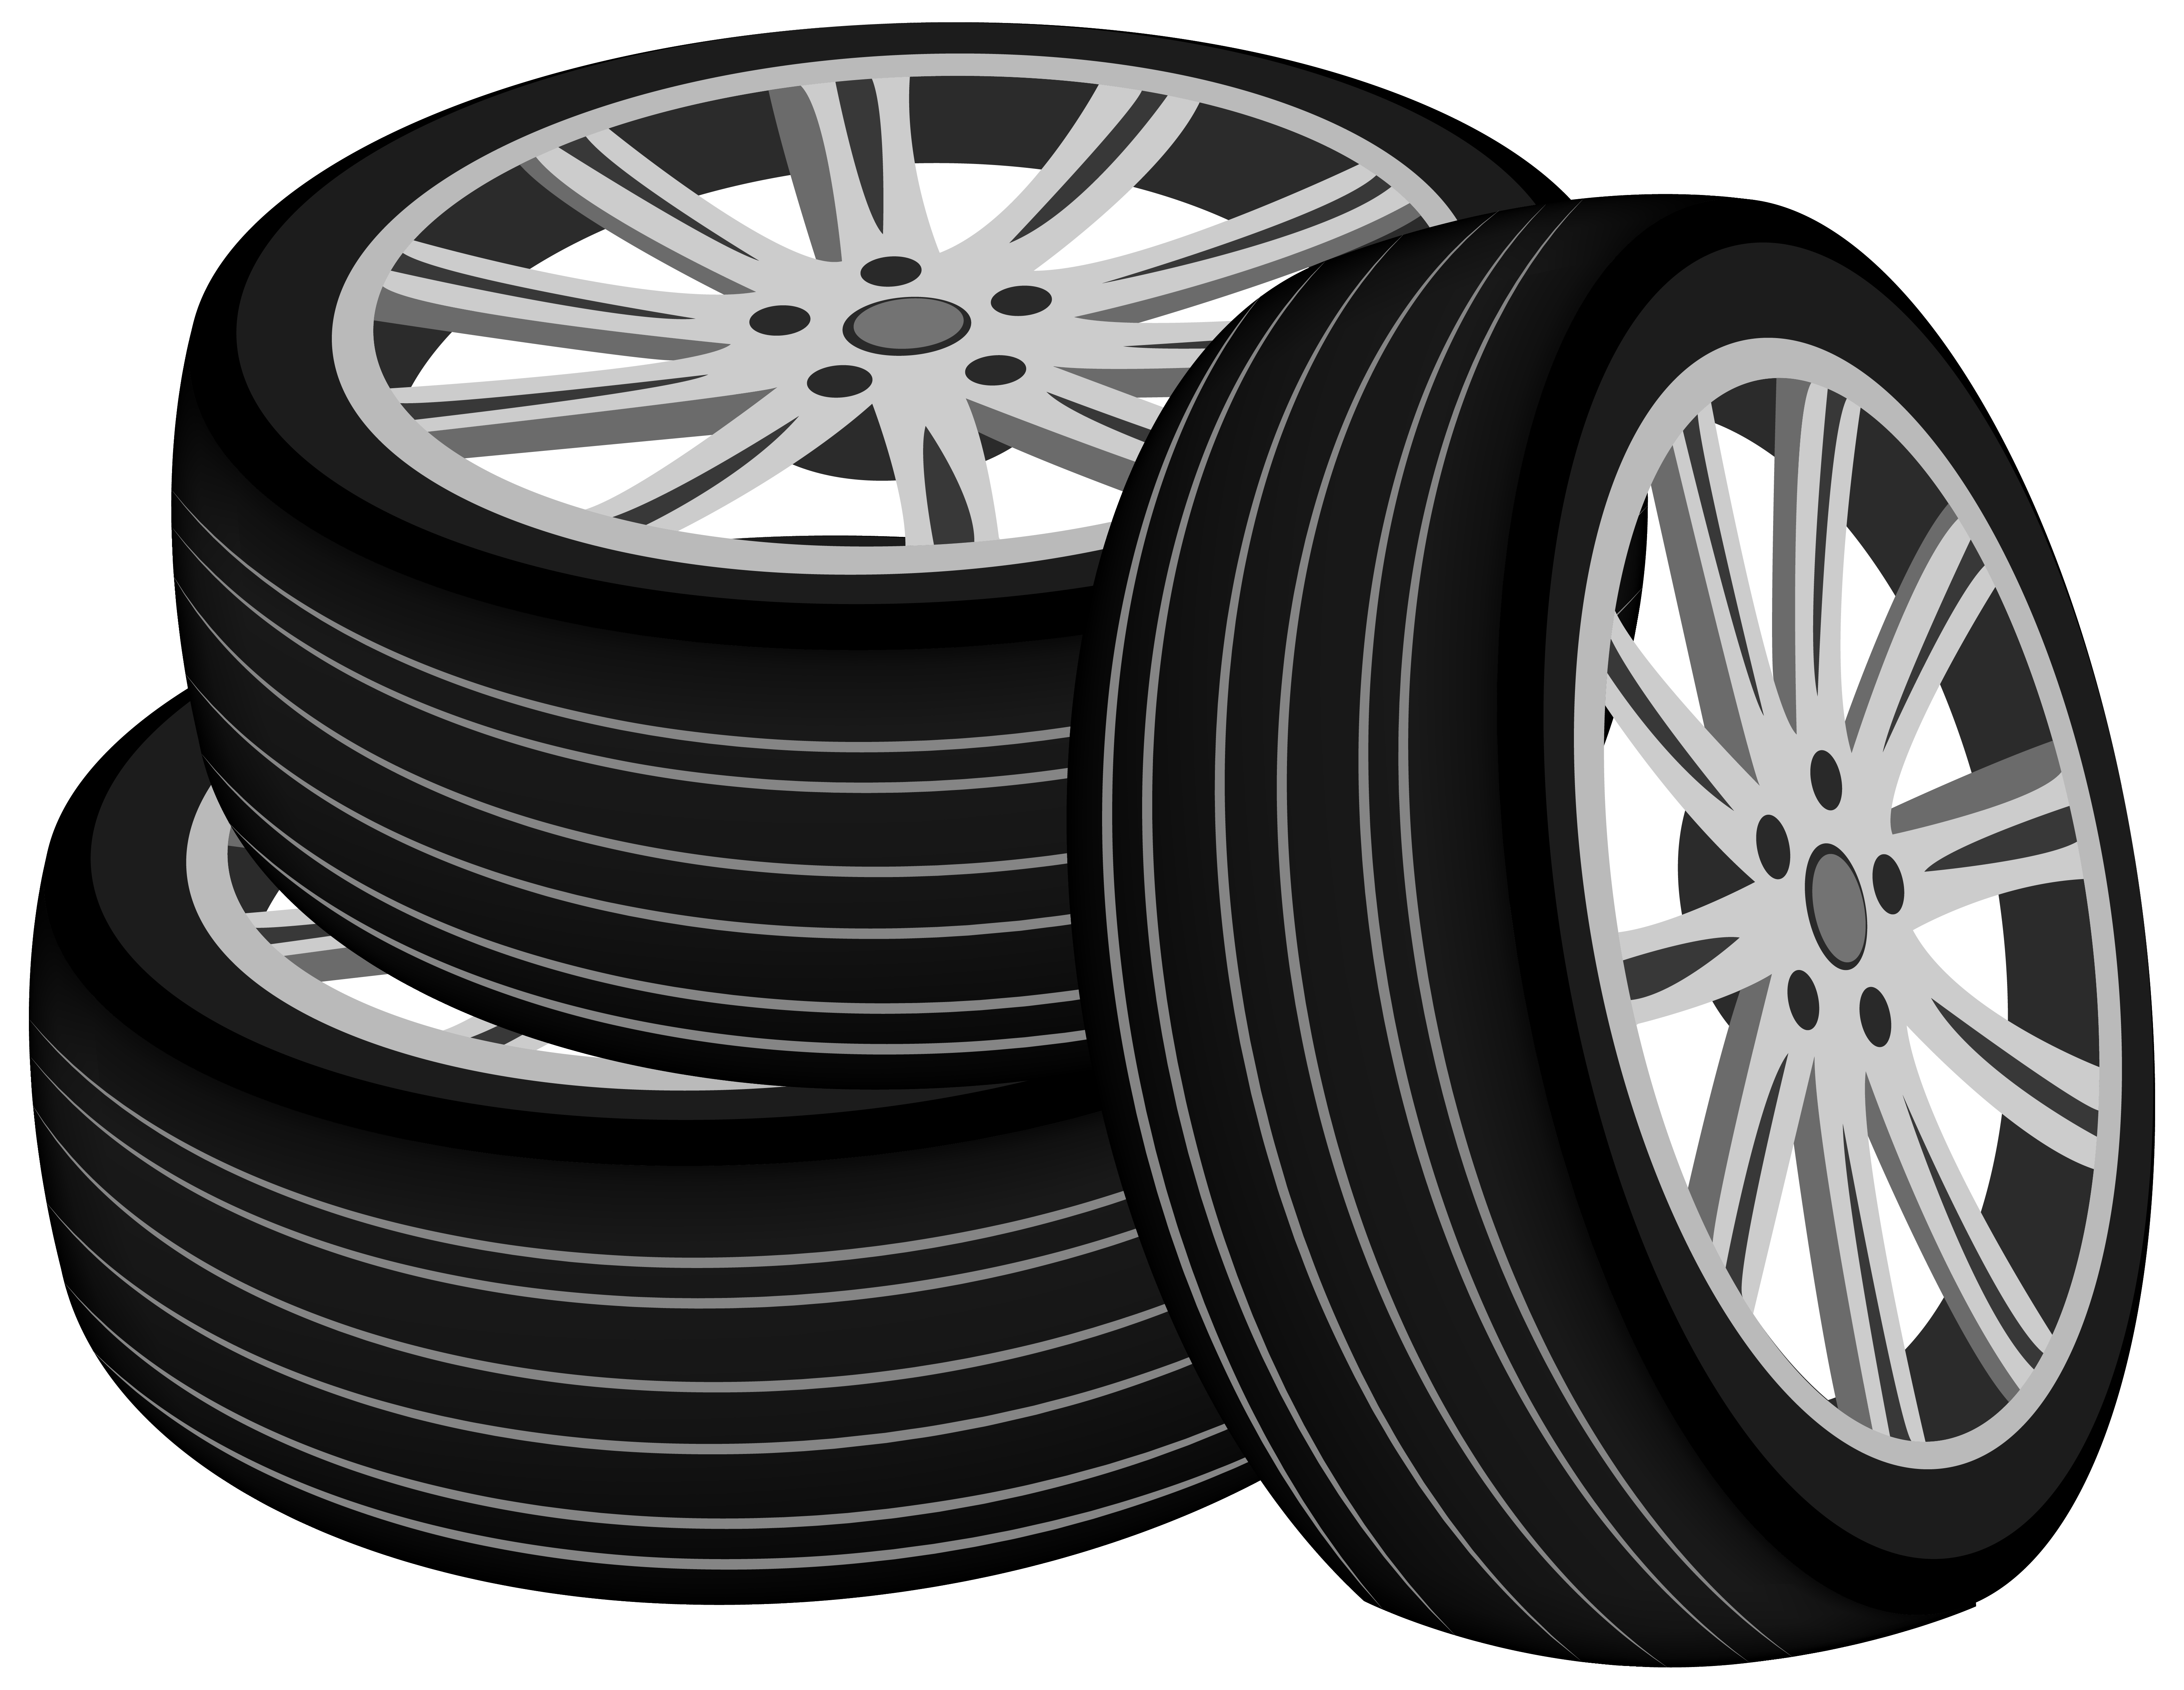 Tires clipart Pie Clipart Clipart Savoronmorehead Tires